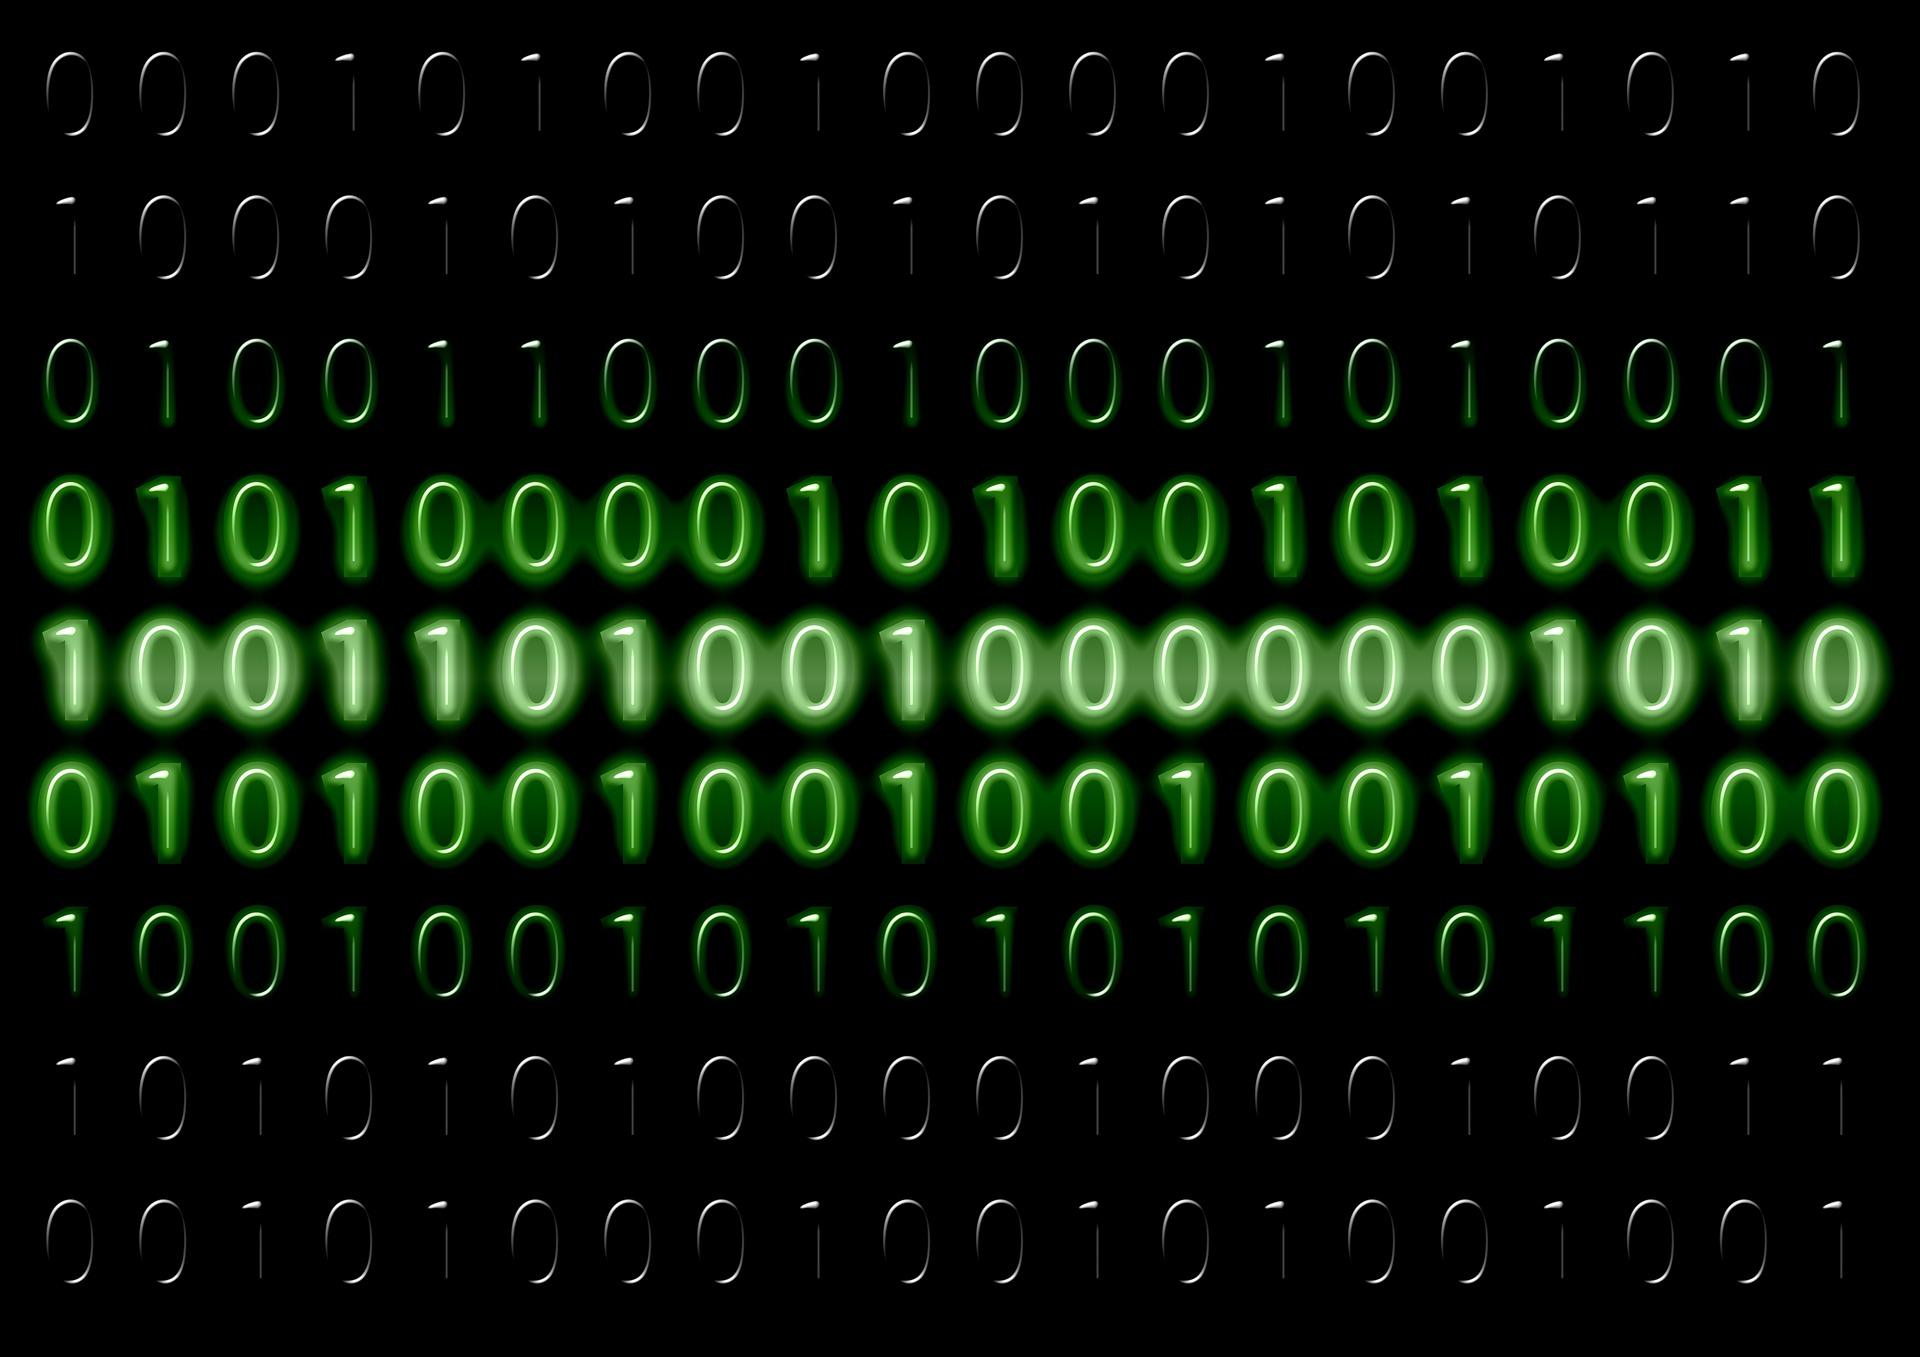 JANコード(GS1事業者コード)とは??